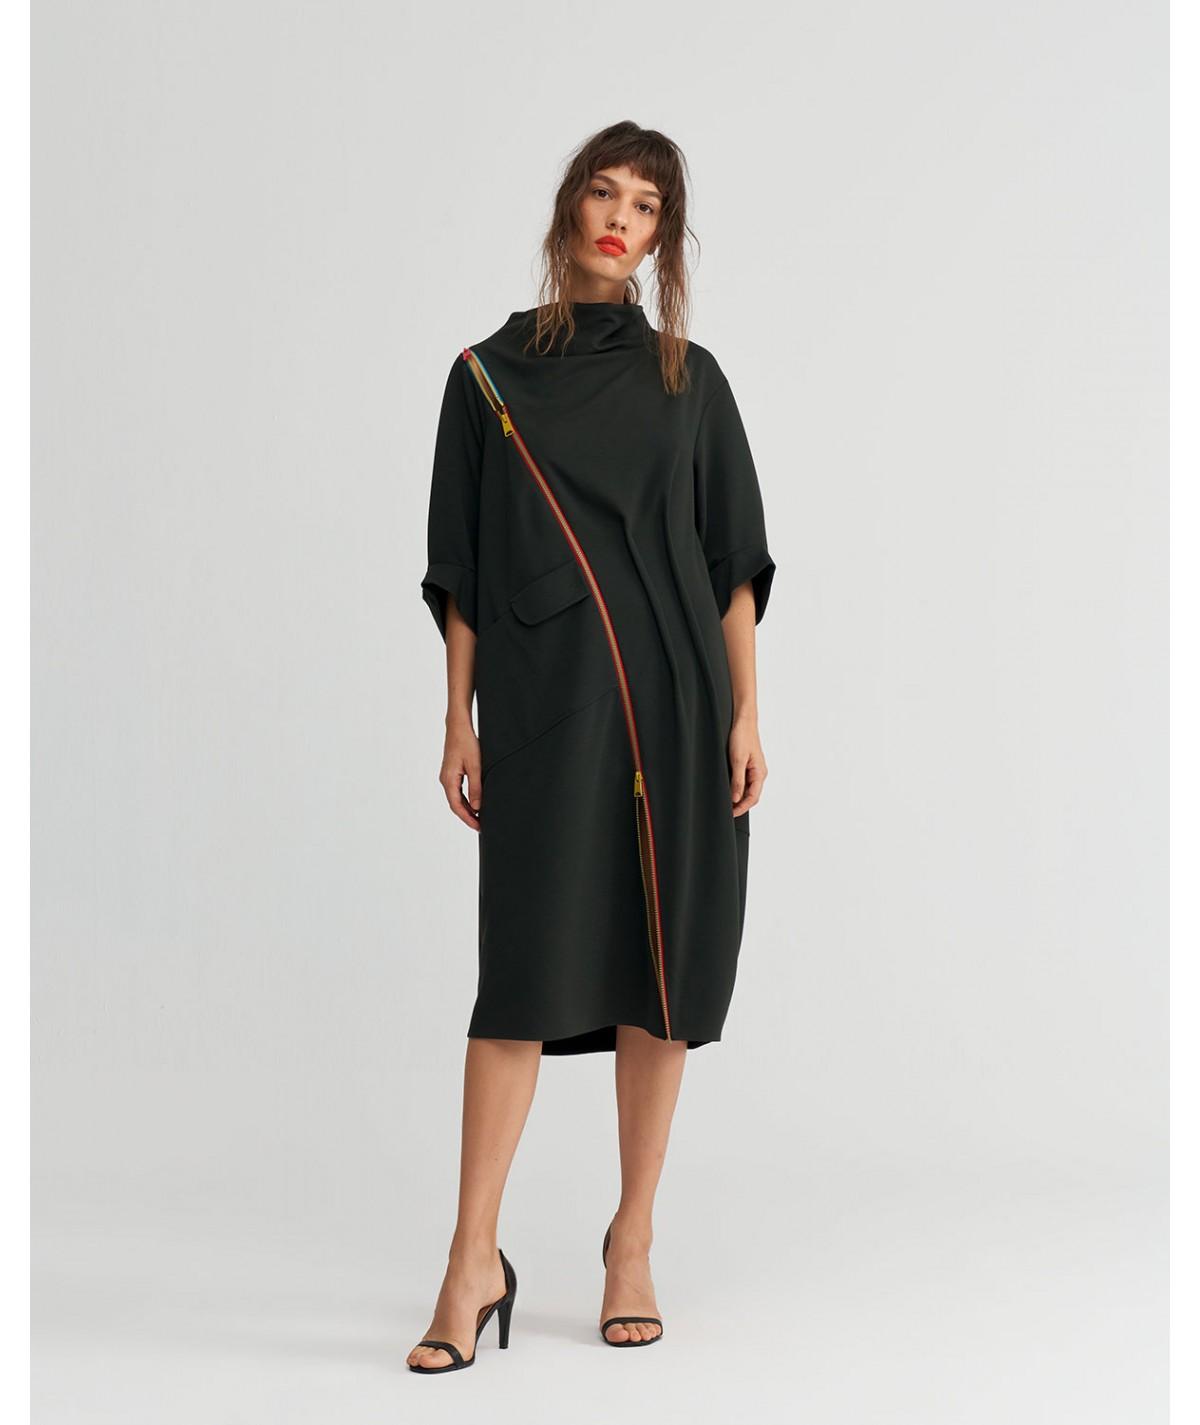 Liria Homewear Elbise